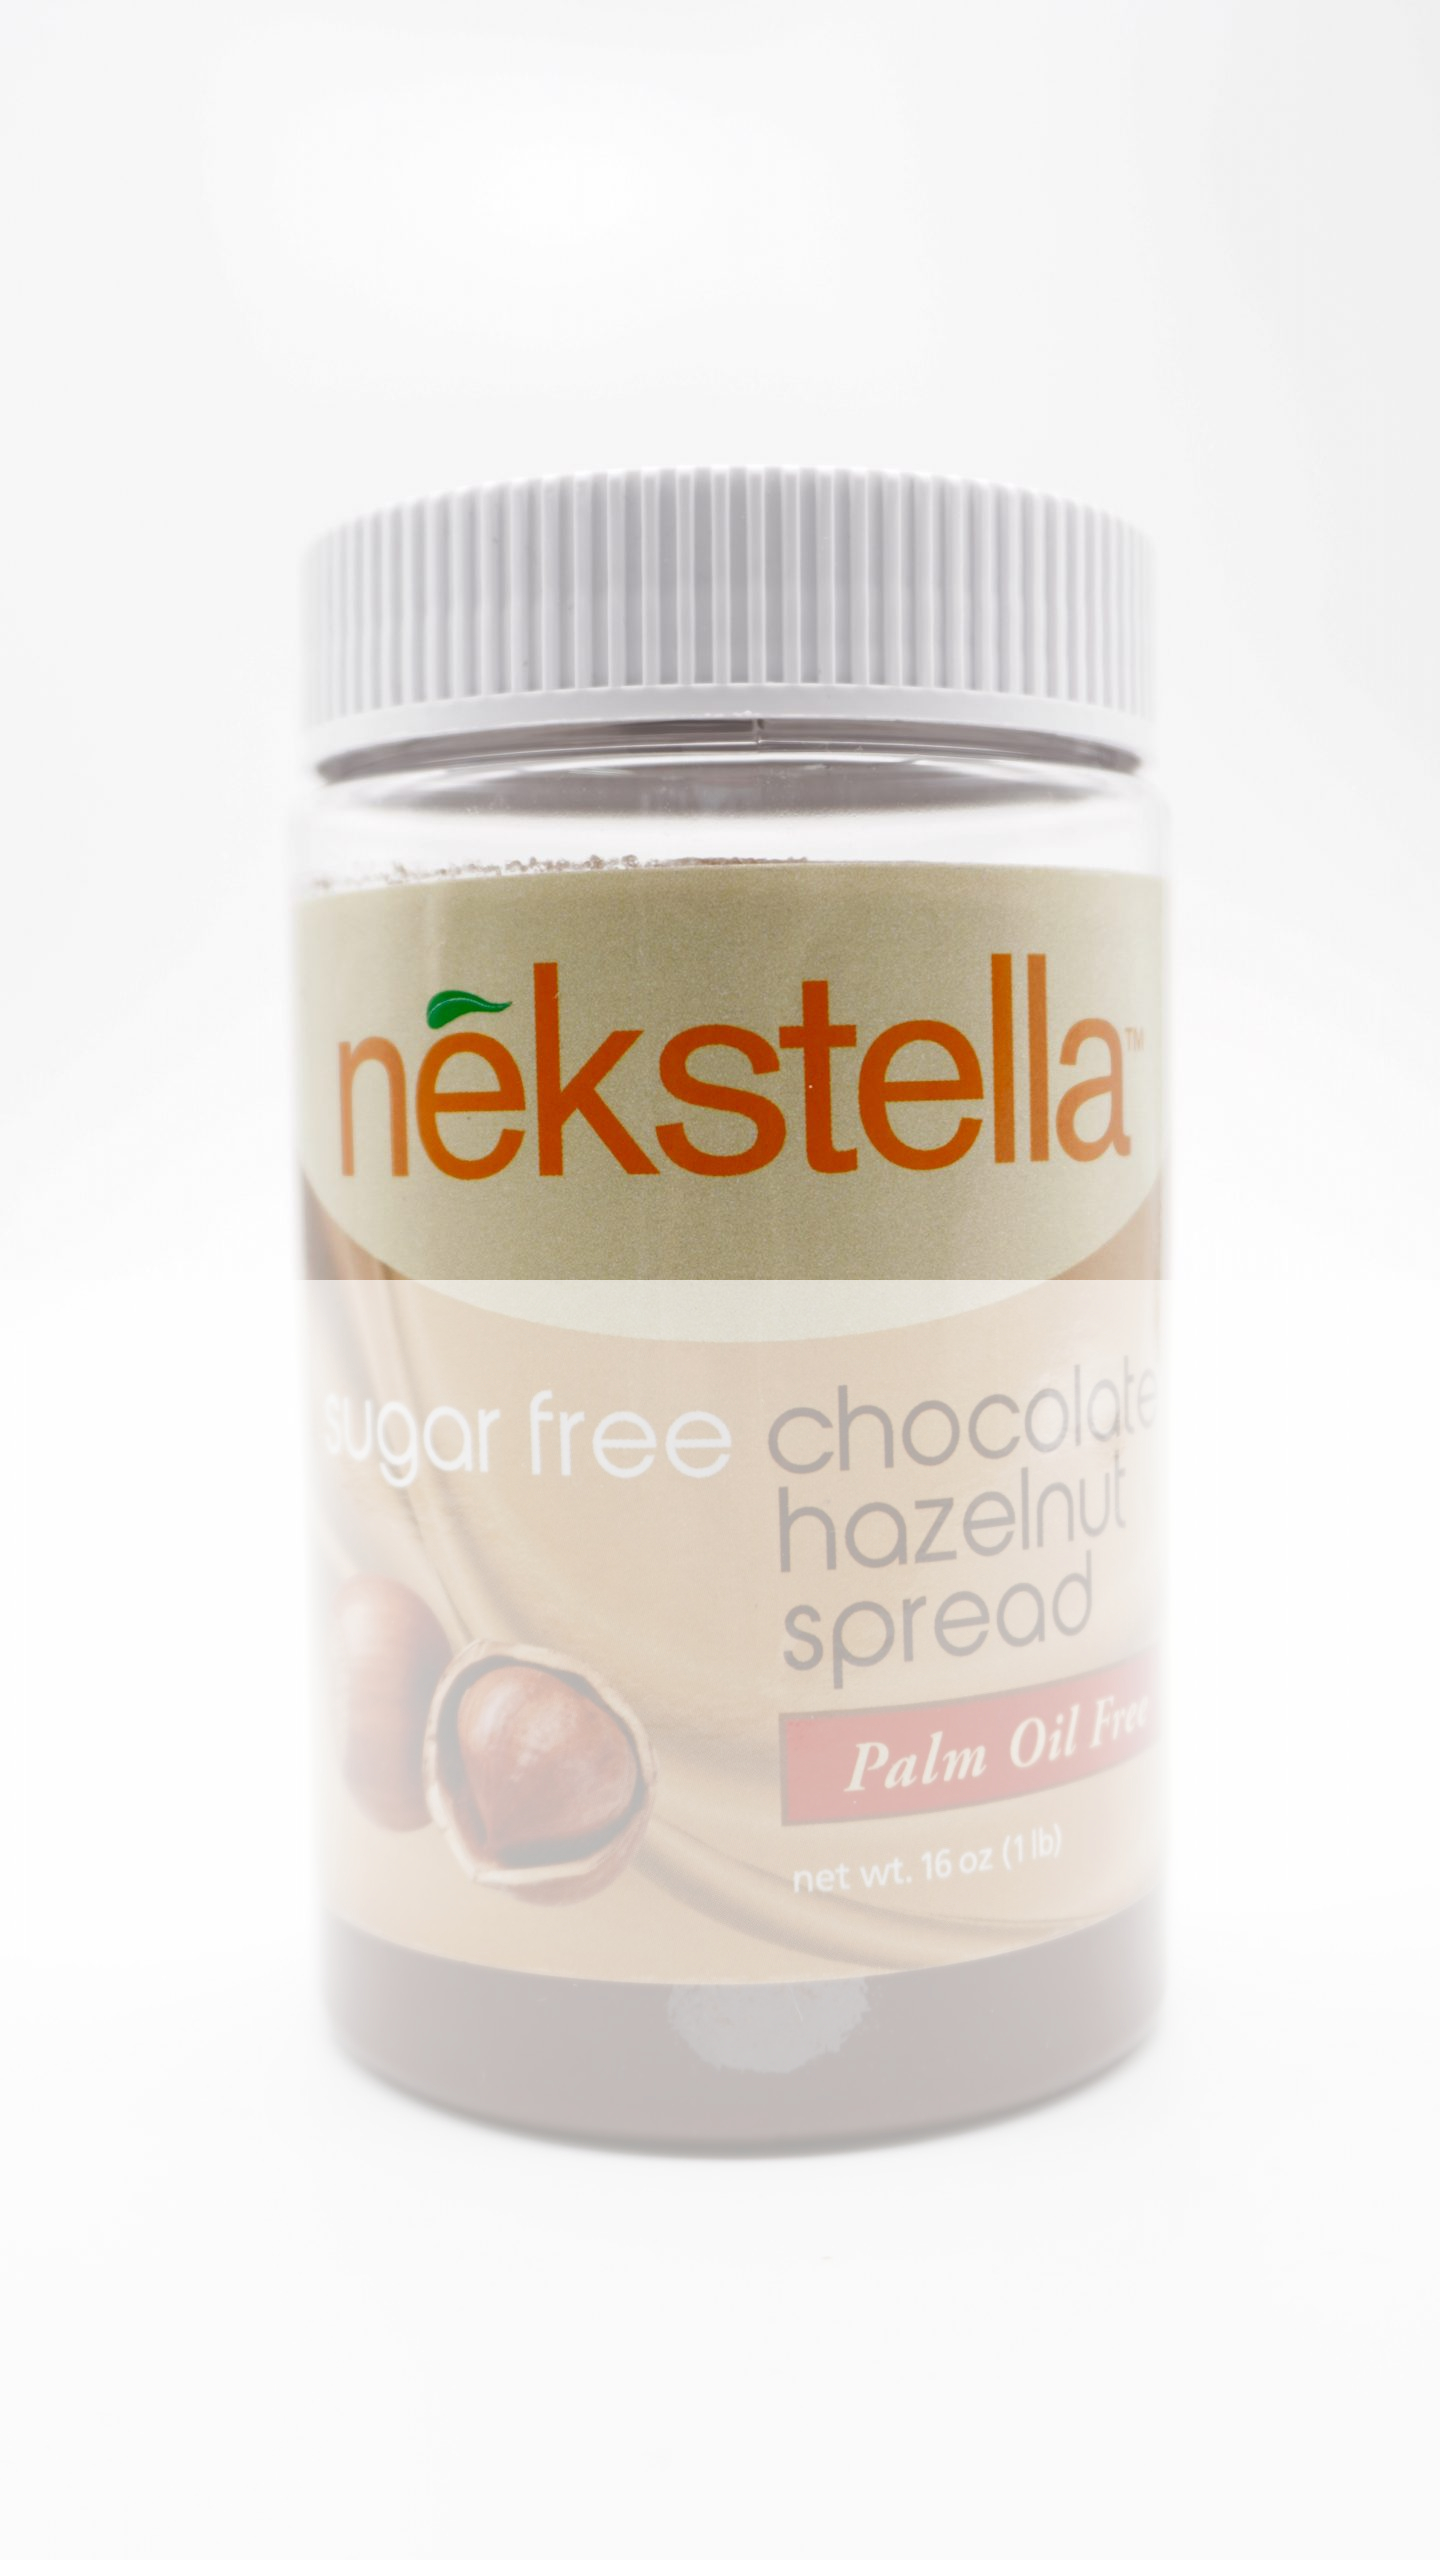 nekstella chocolate hazelnut spread